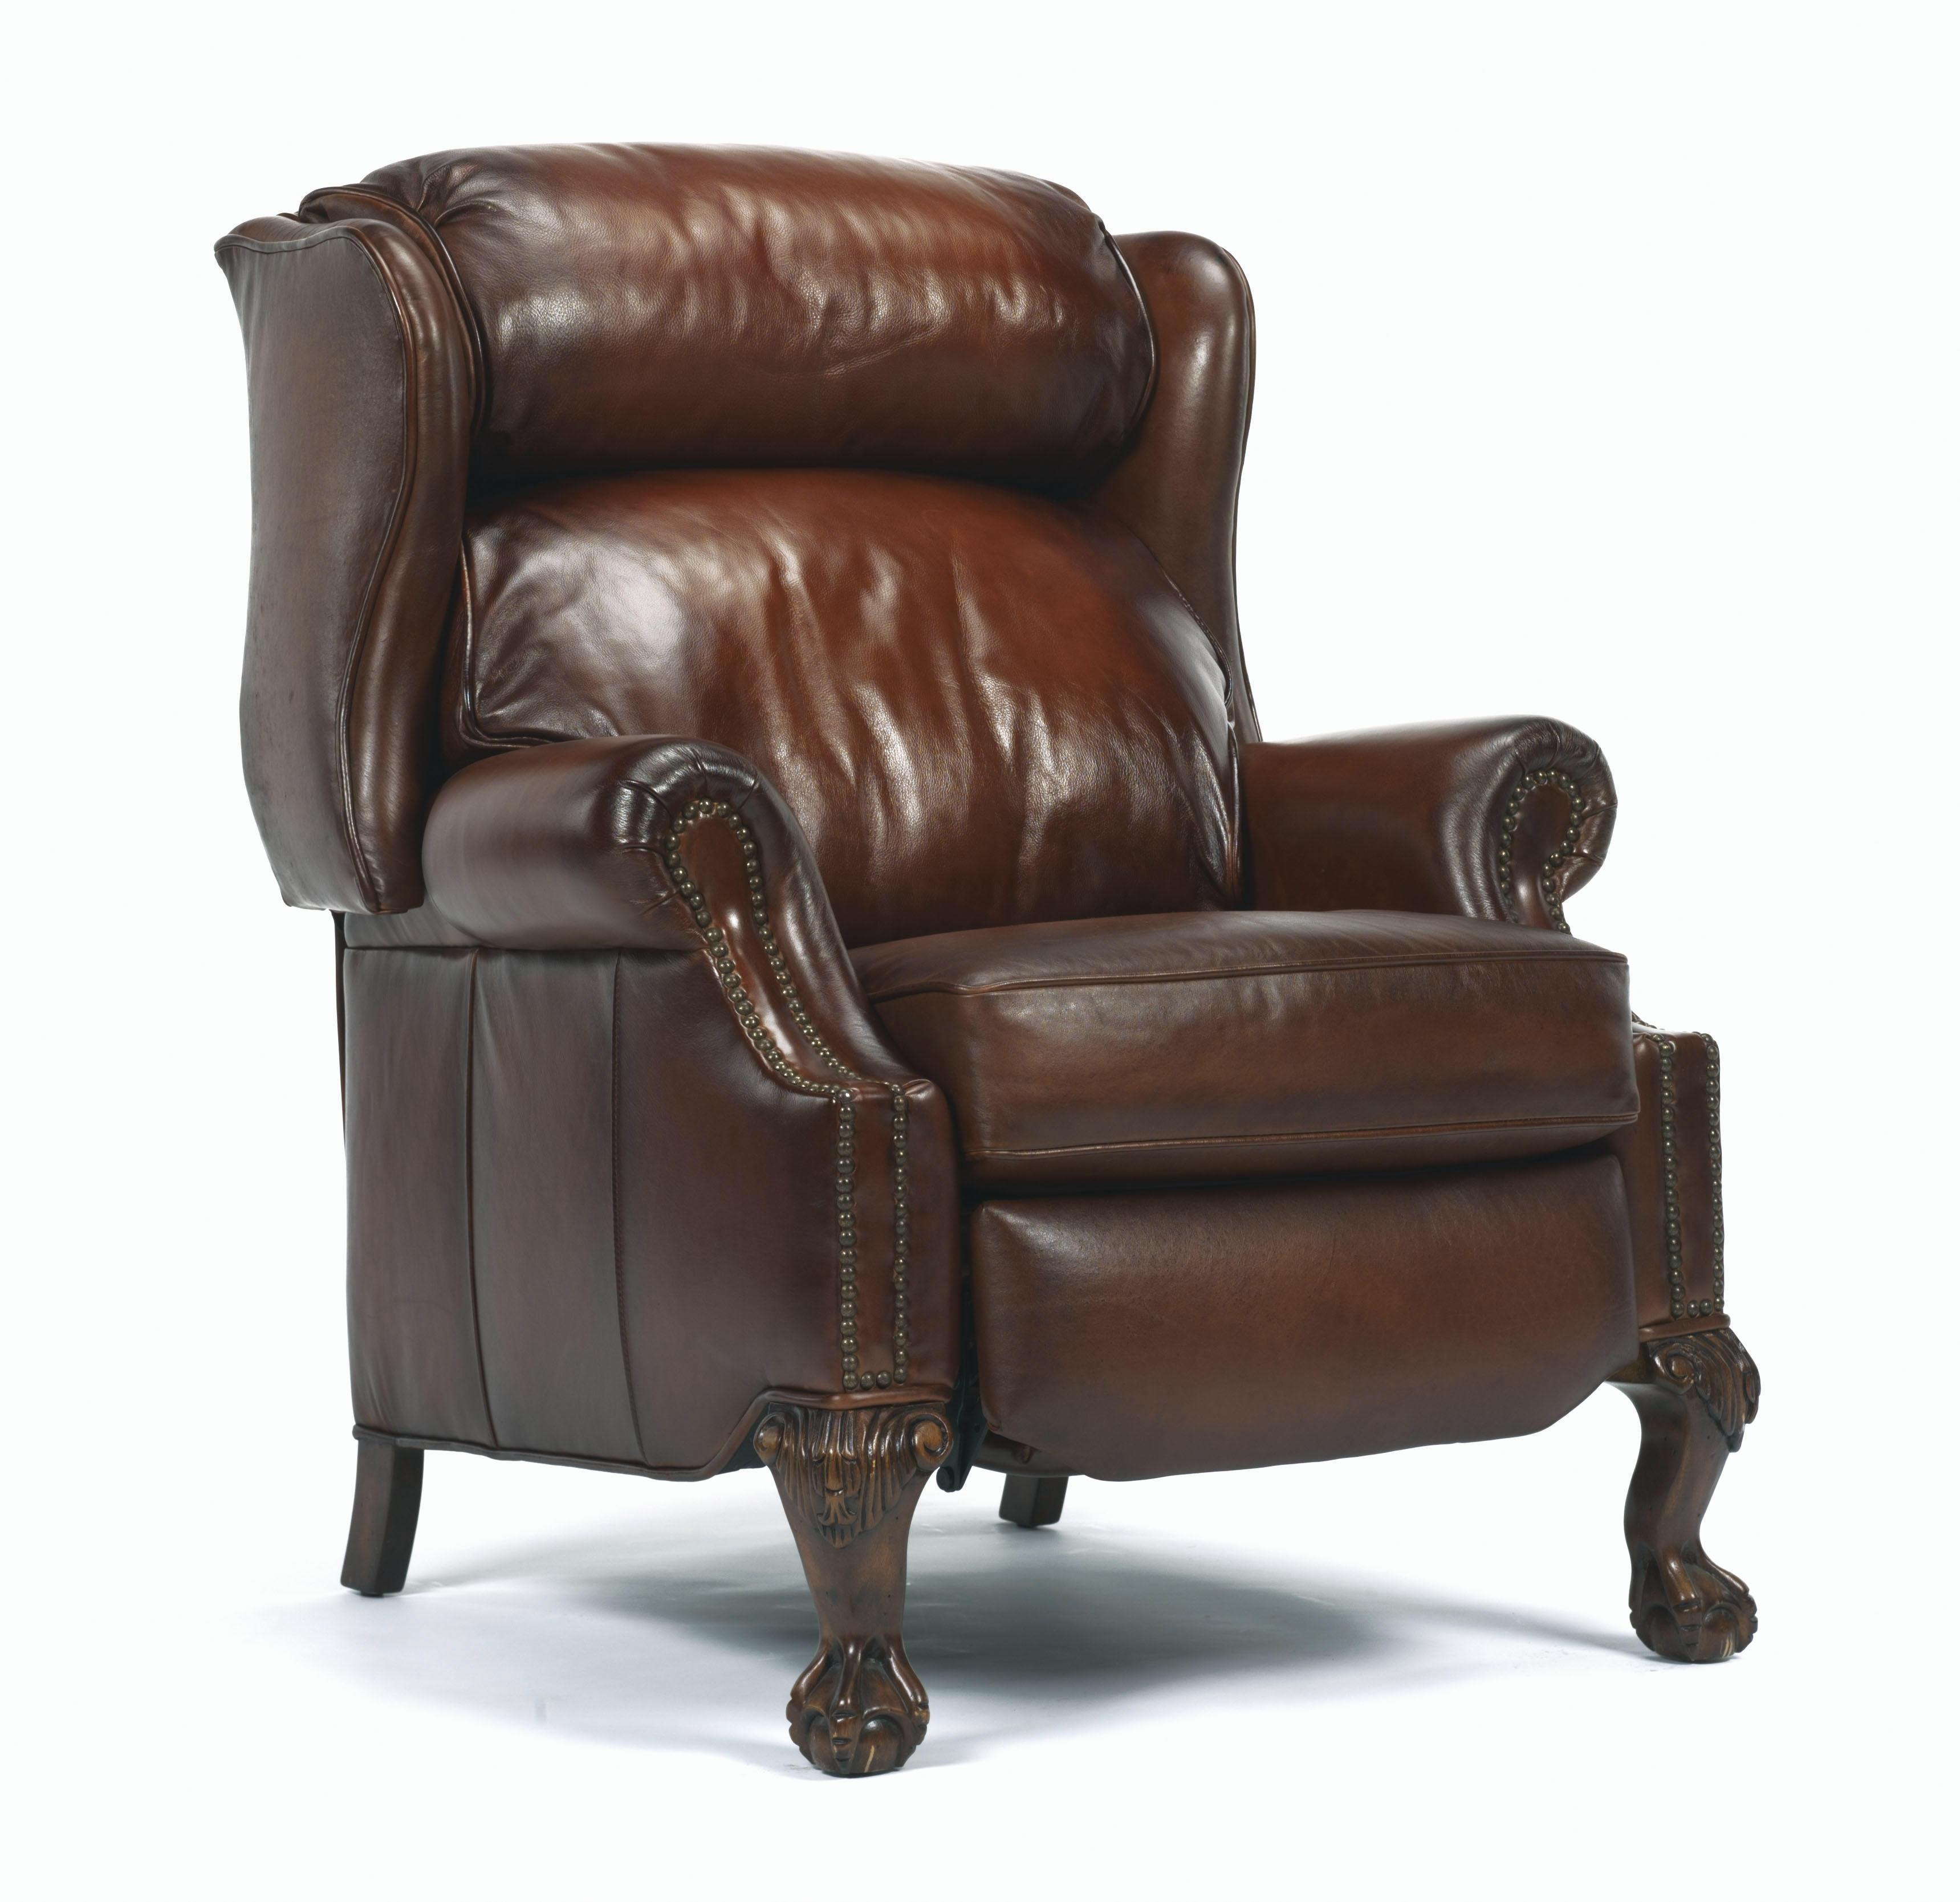 Whitmire's Furniture image 3